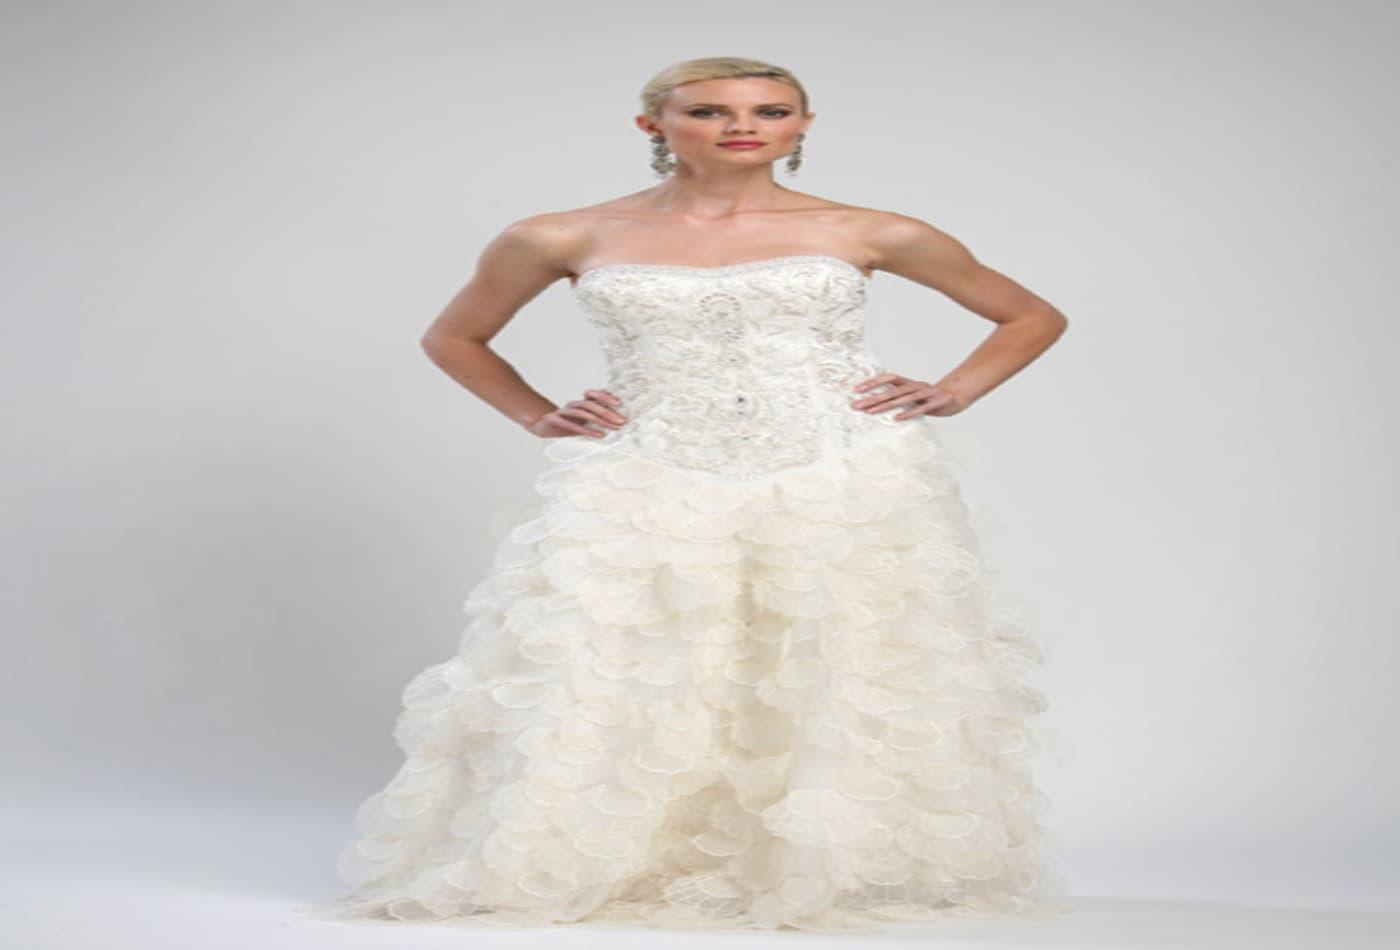 wedding-dresses-less-sue-wong.jpg